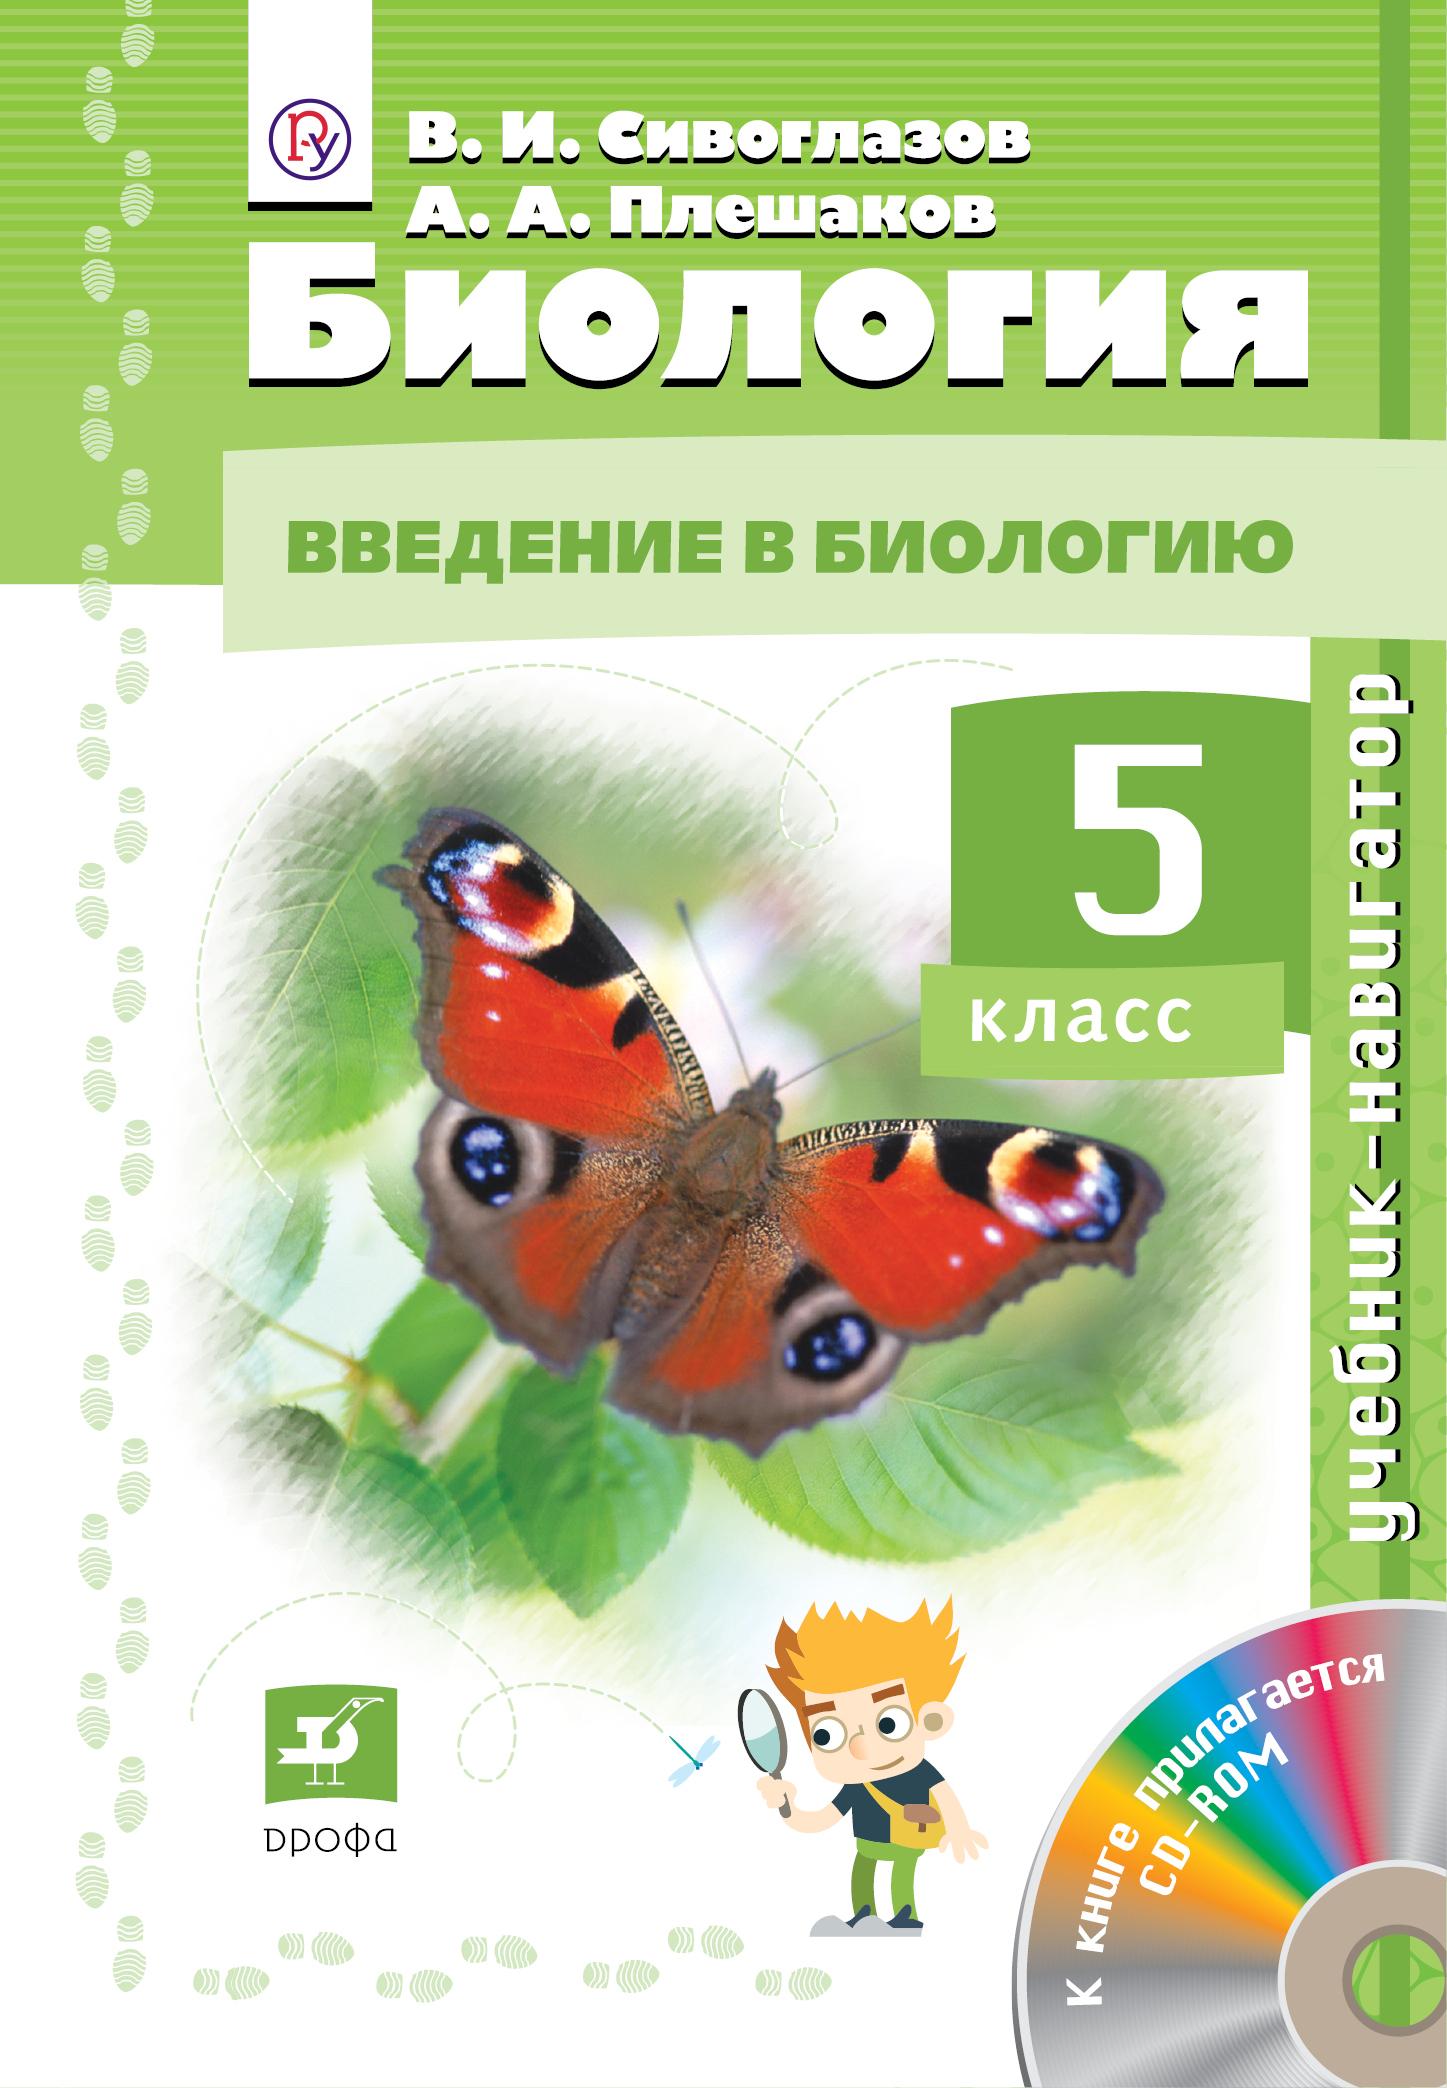 Биология. 5кл. Учебник-навигатор. Учебник + CD.